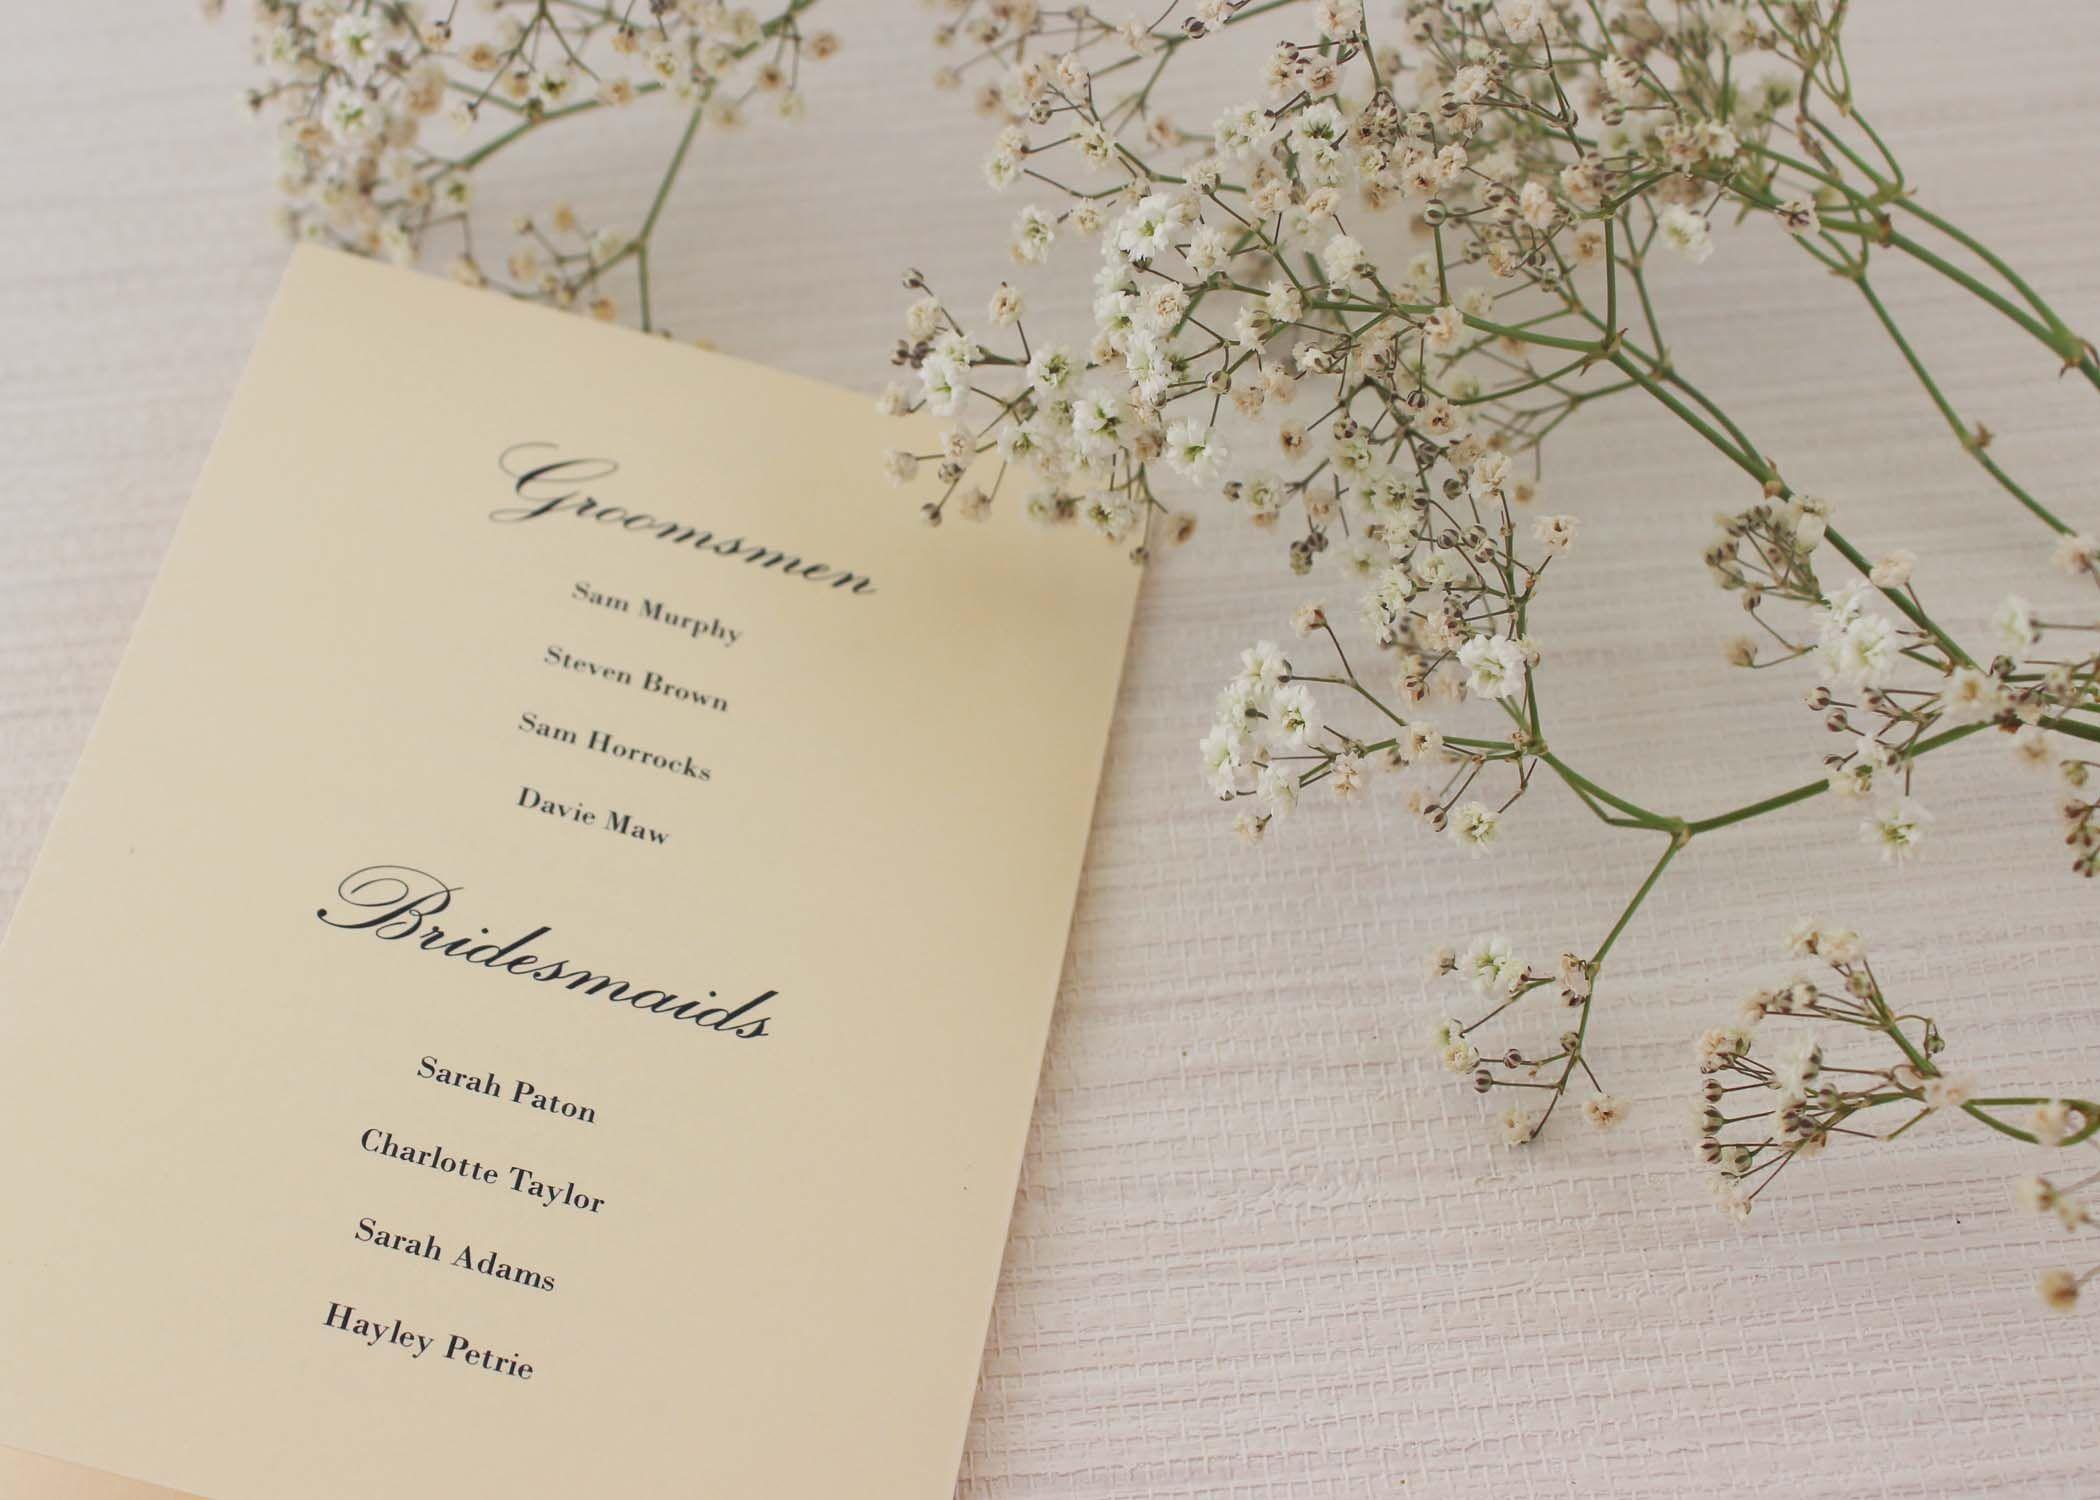 Traditional Monogram Order of Services | Service program, Wedding ...